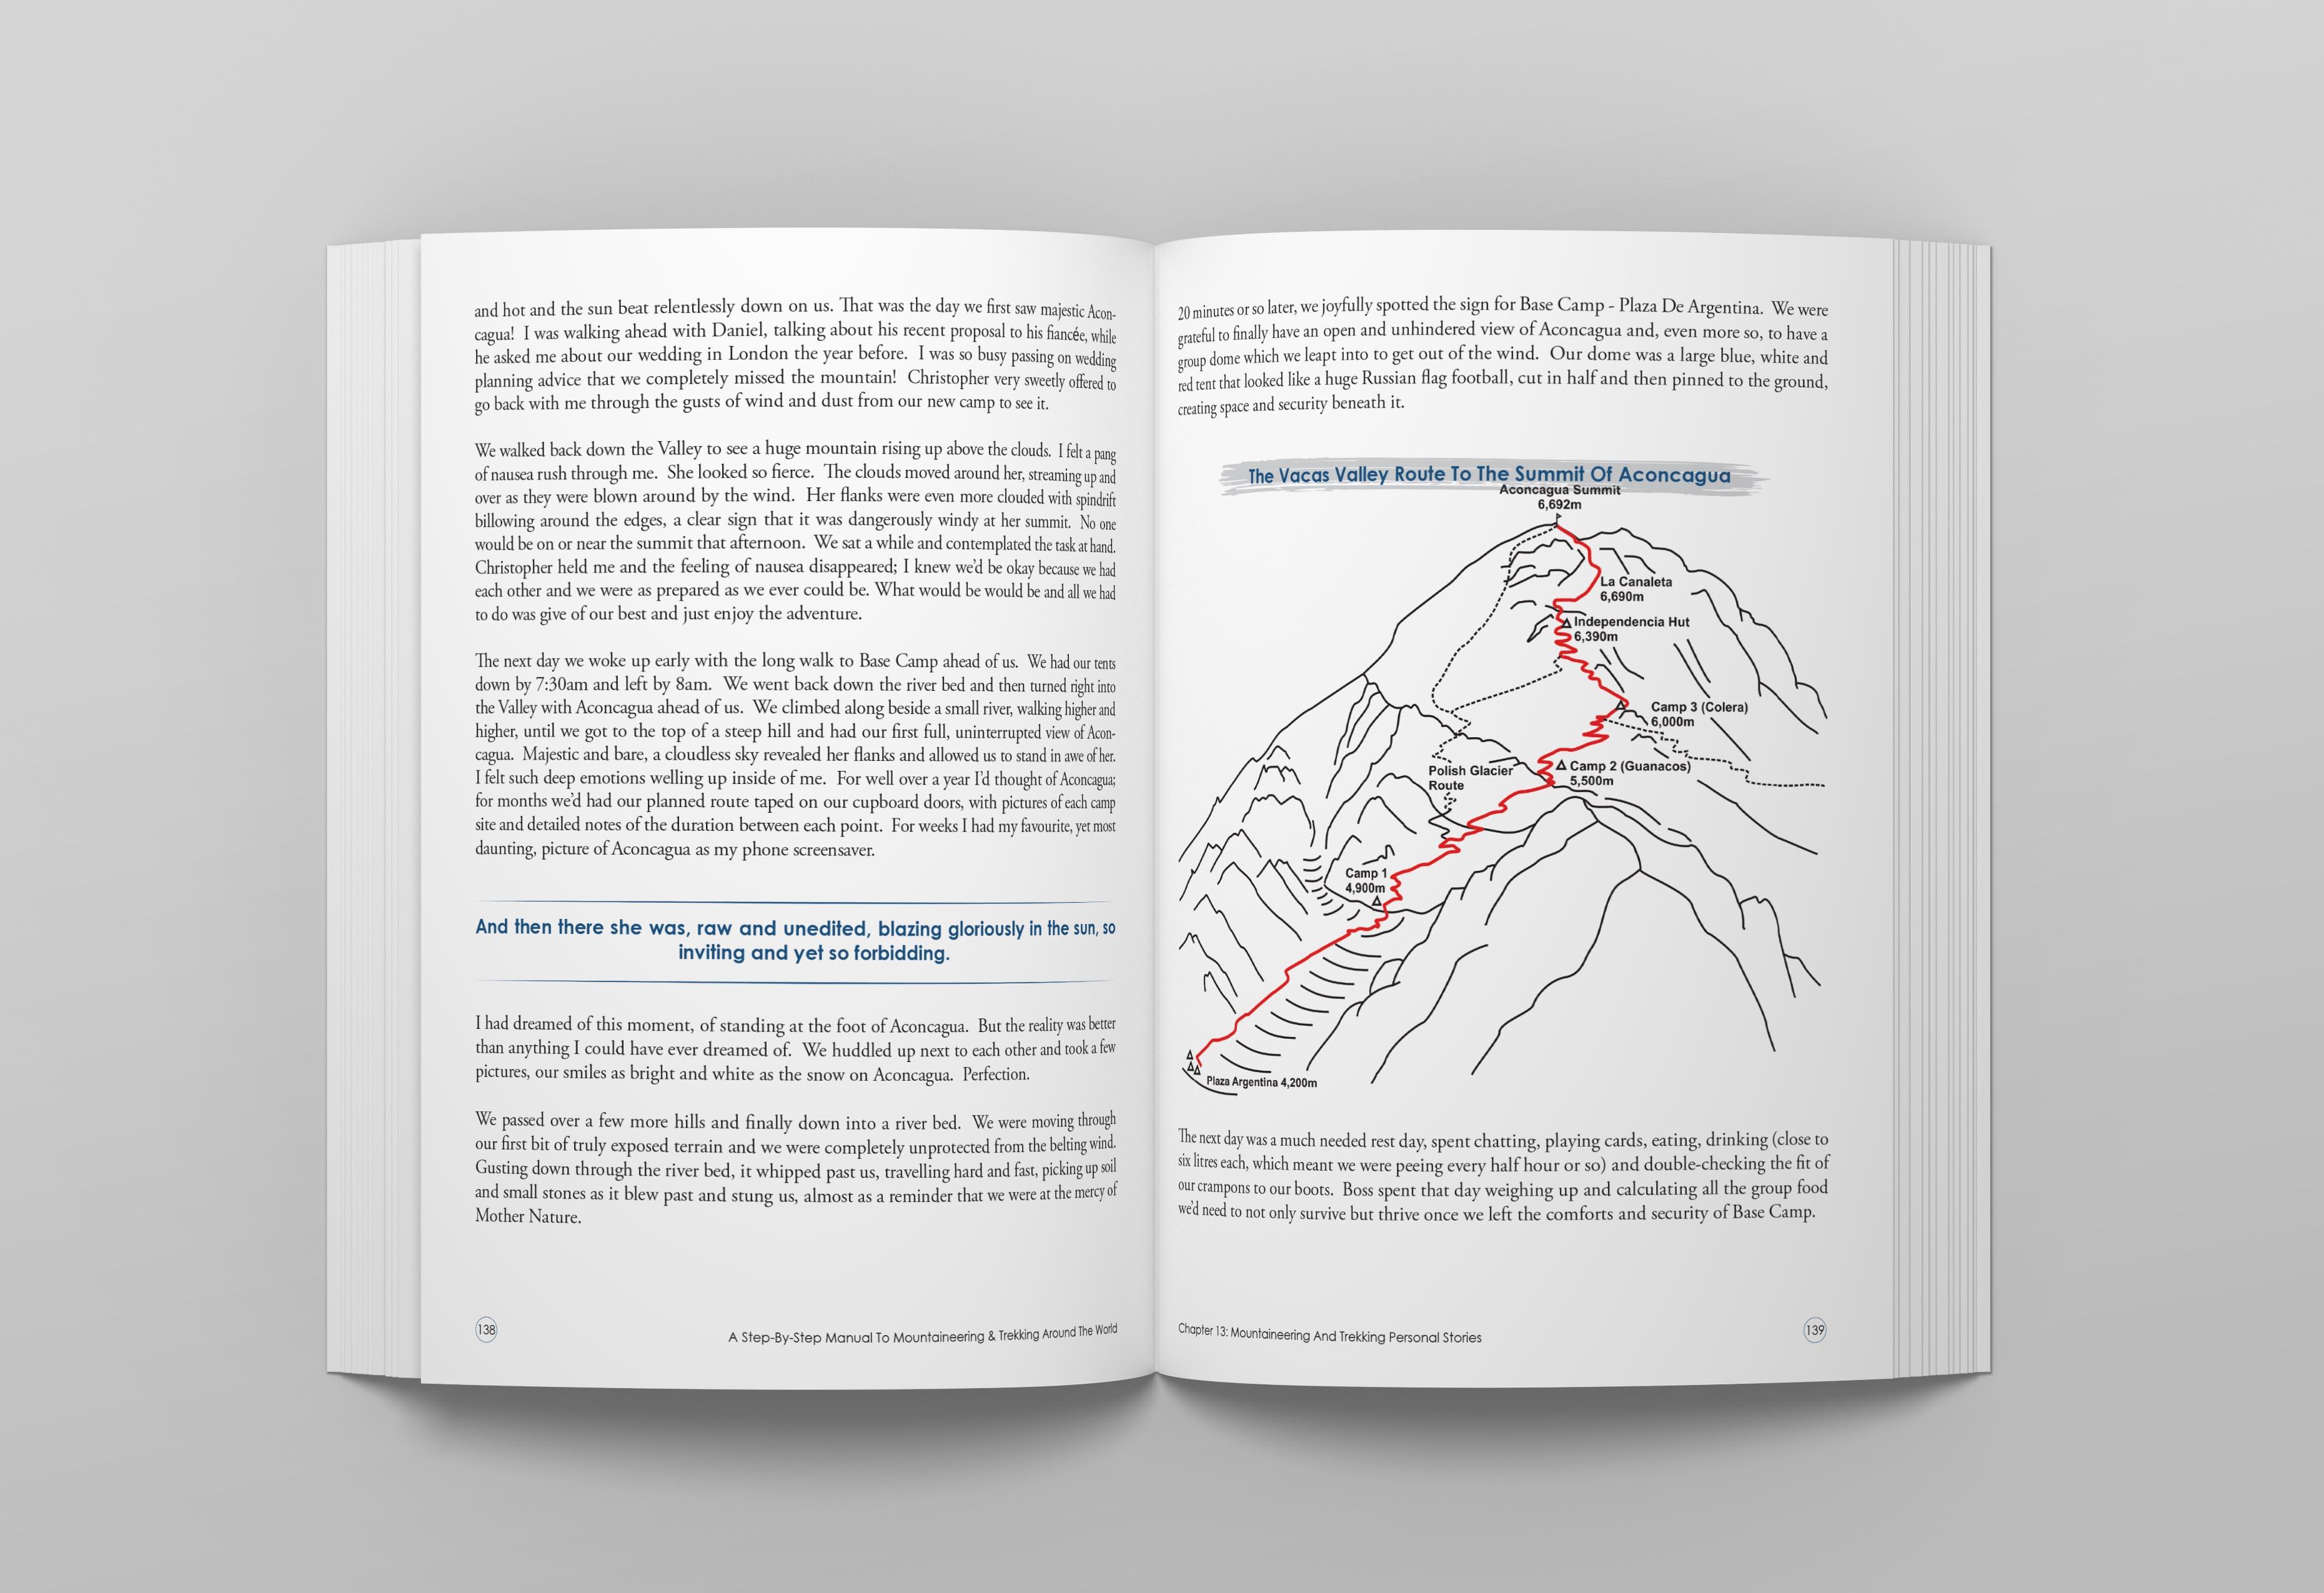 Page 138 and 139 - bottom row, image on